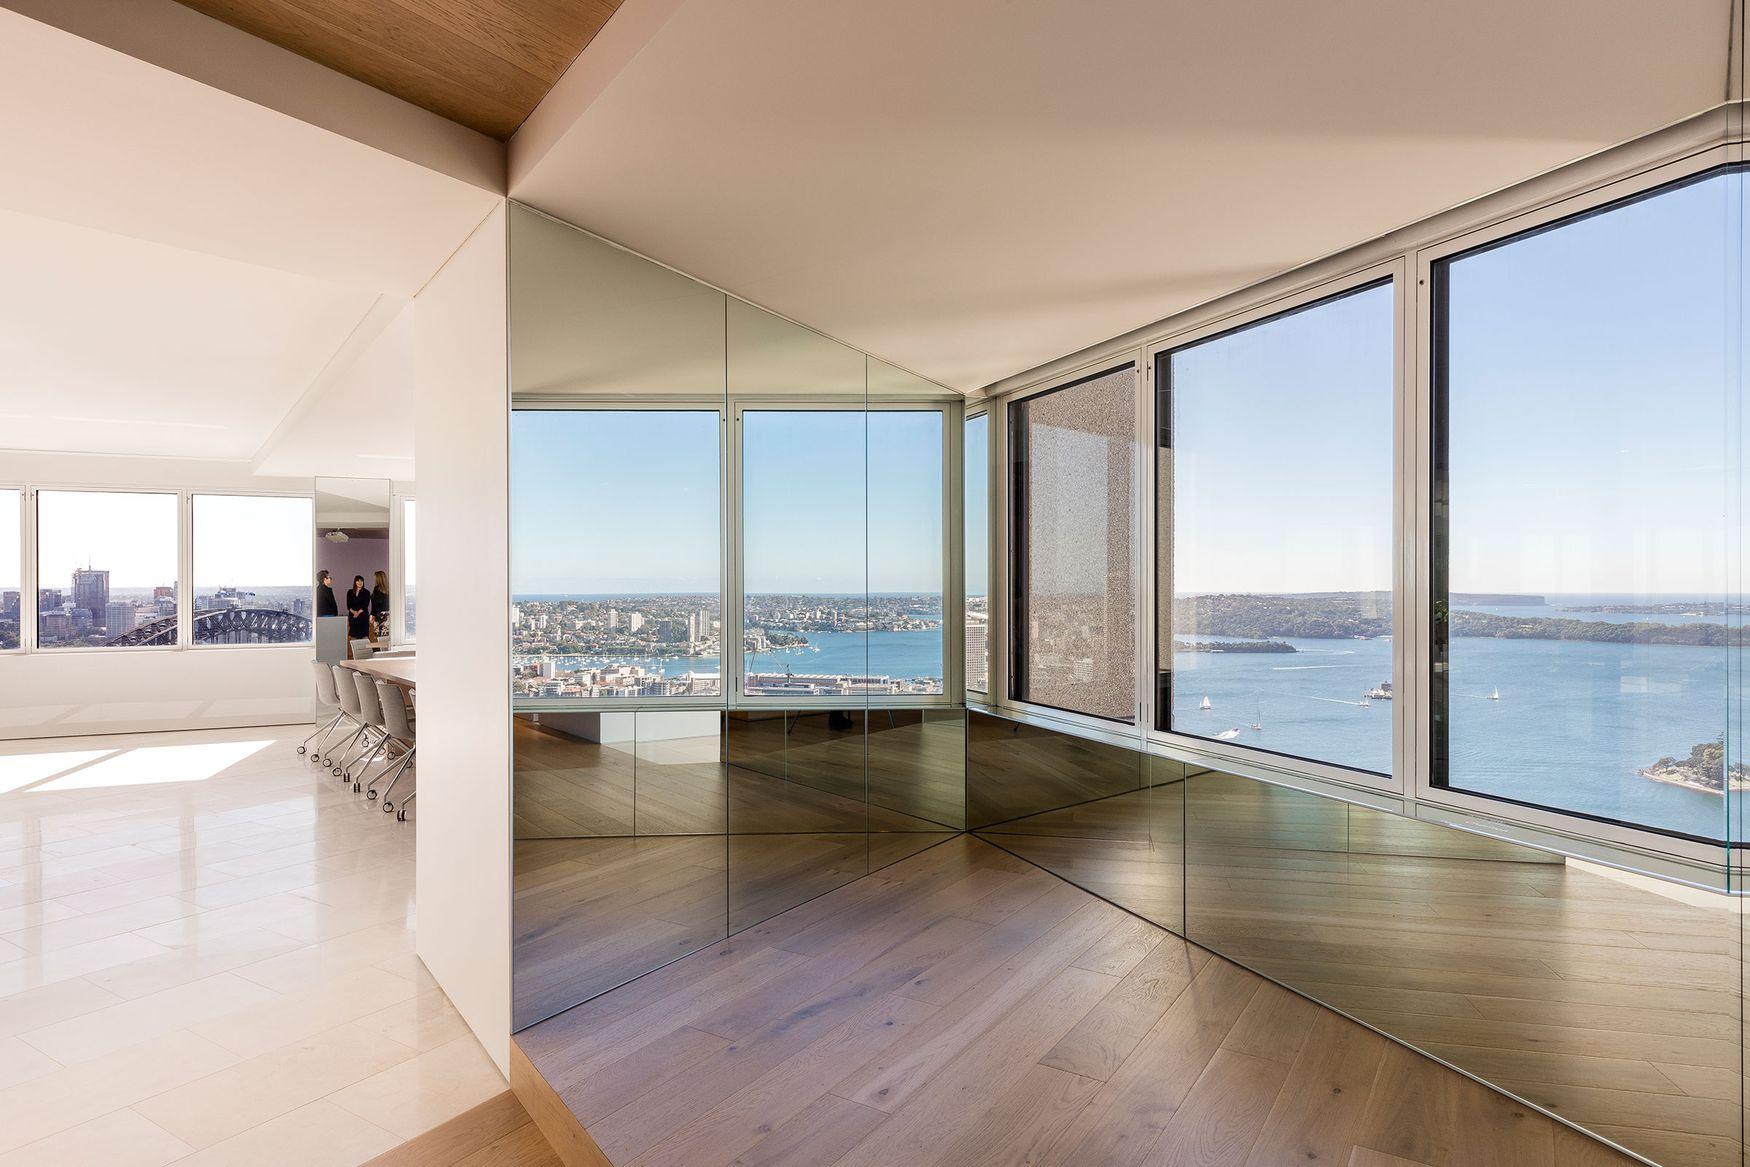 The Future of Sydney on Display